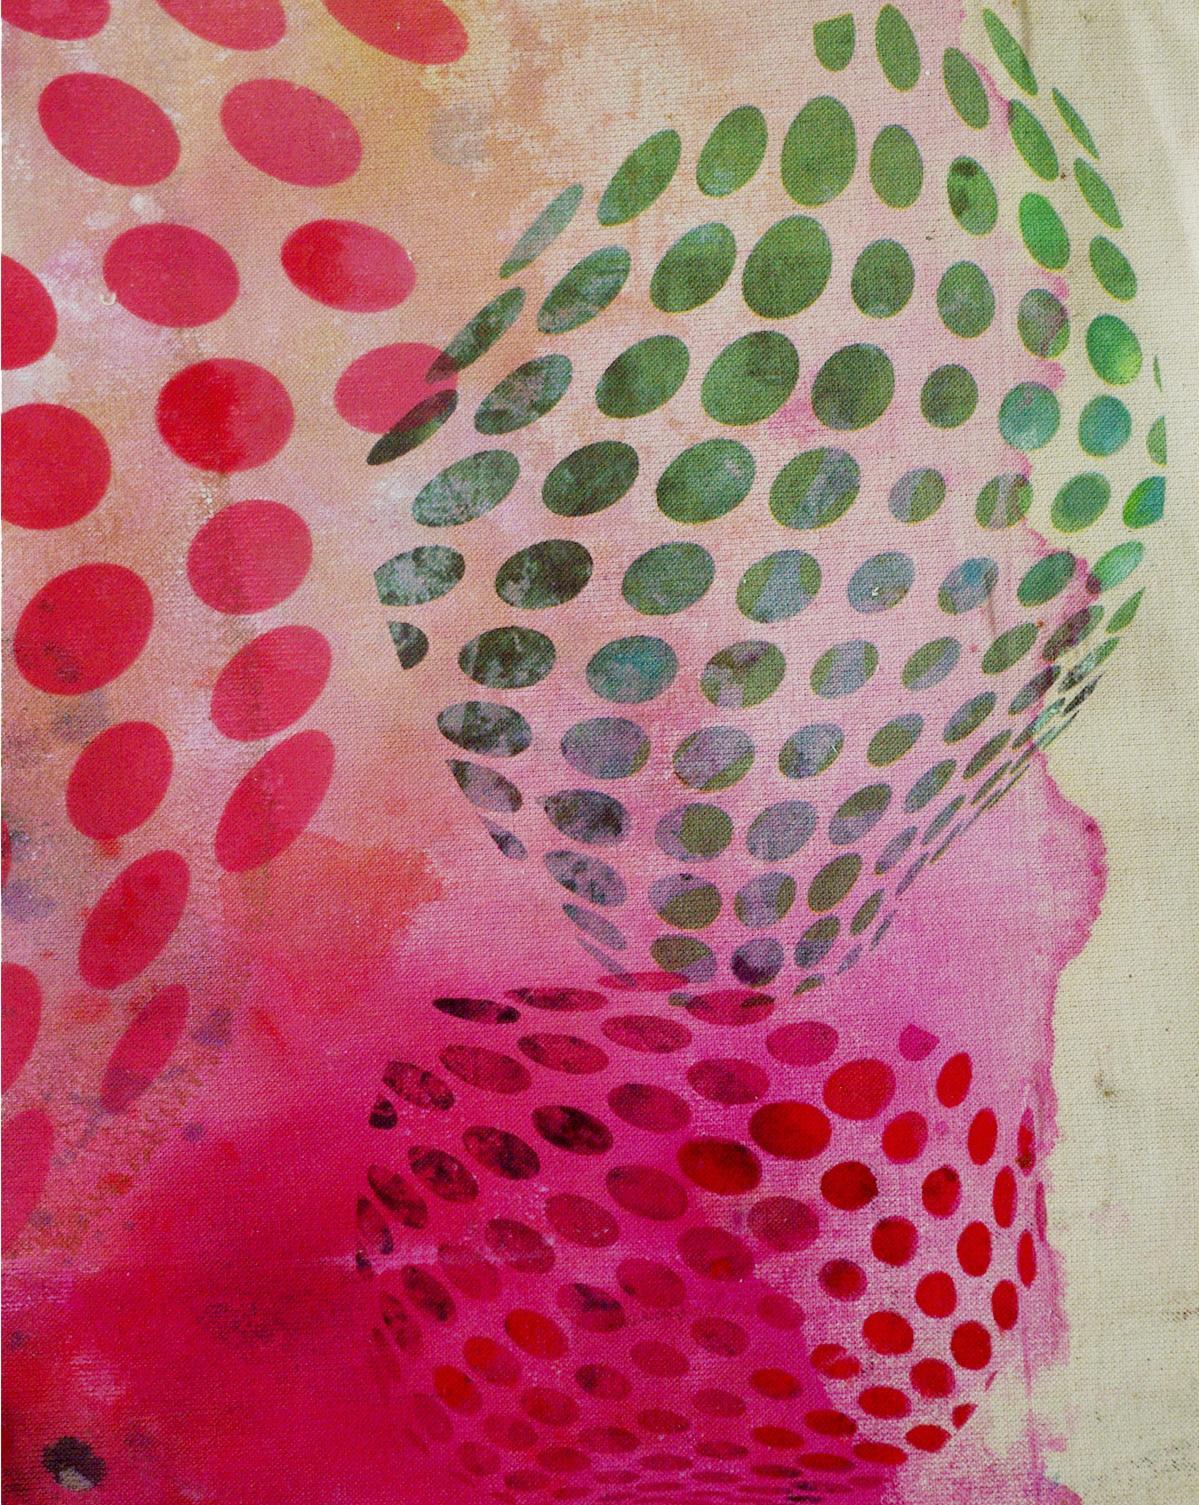 Nest 004 - Contemporary, Abstract, Expressionist, Modern, Street art, Surrealist